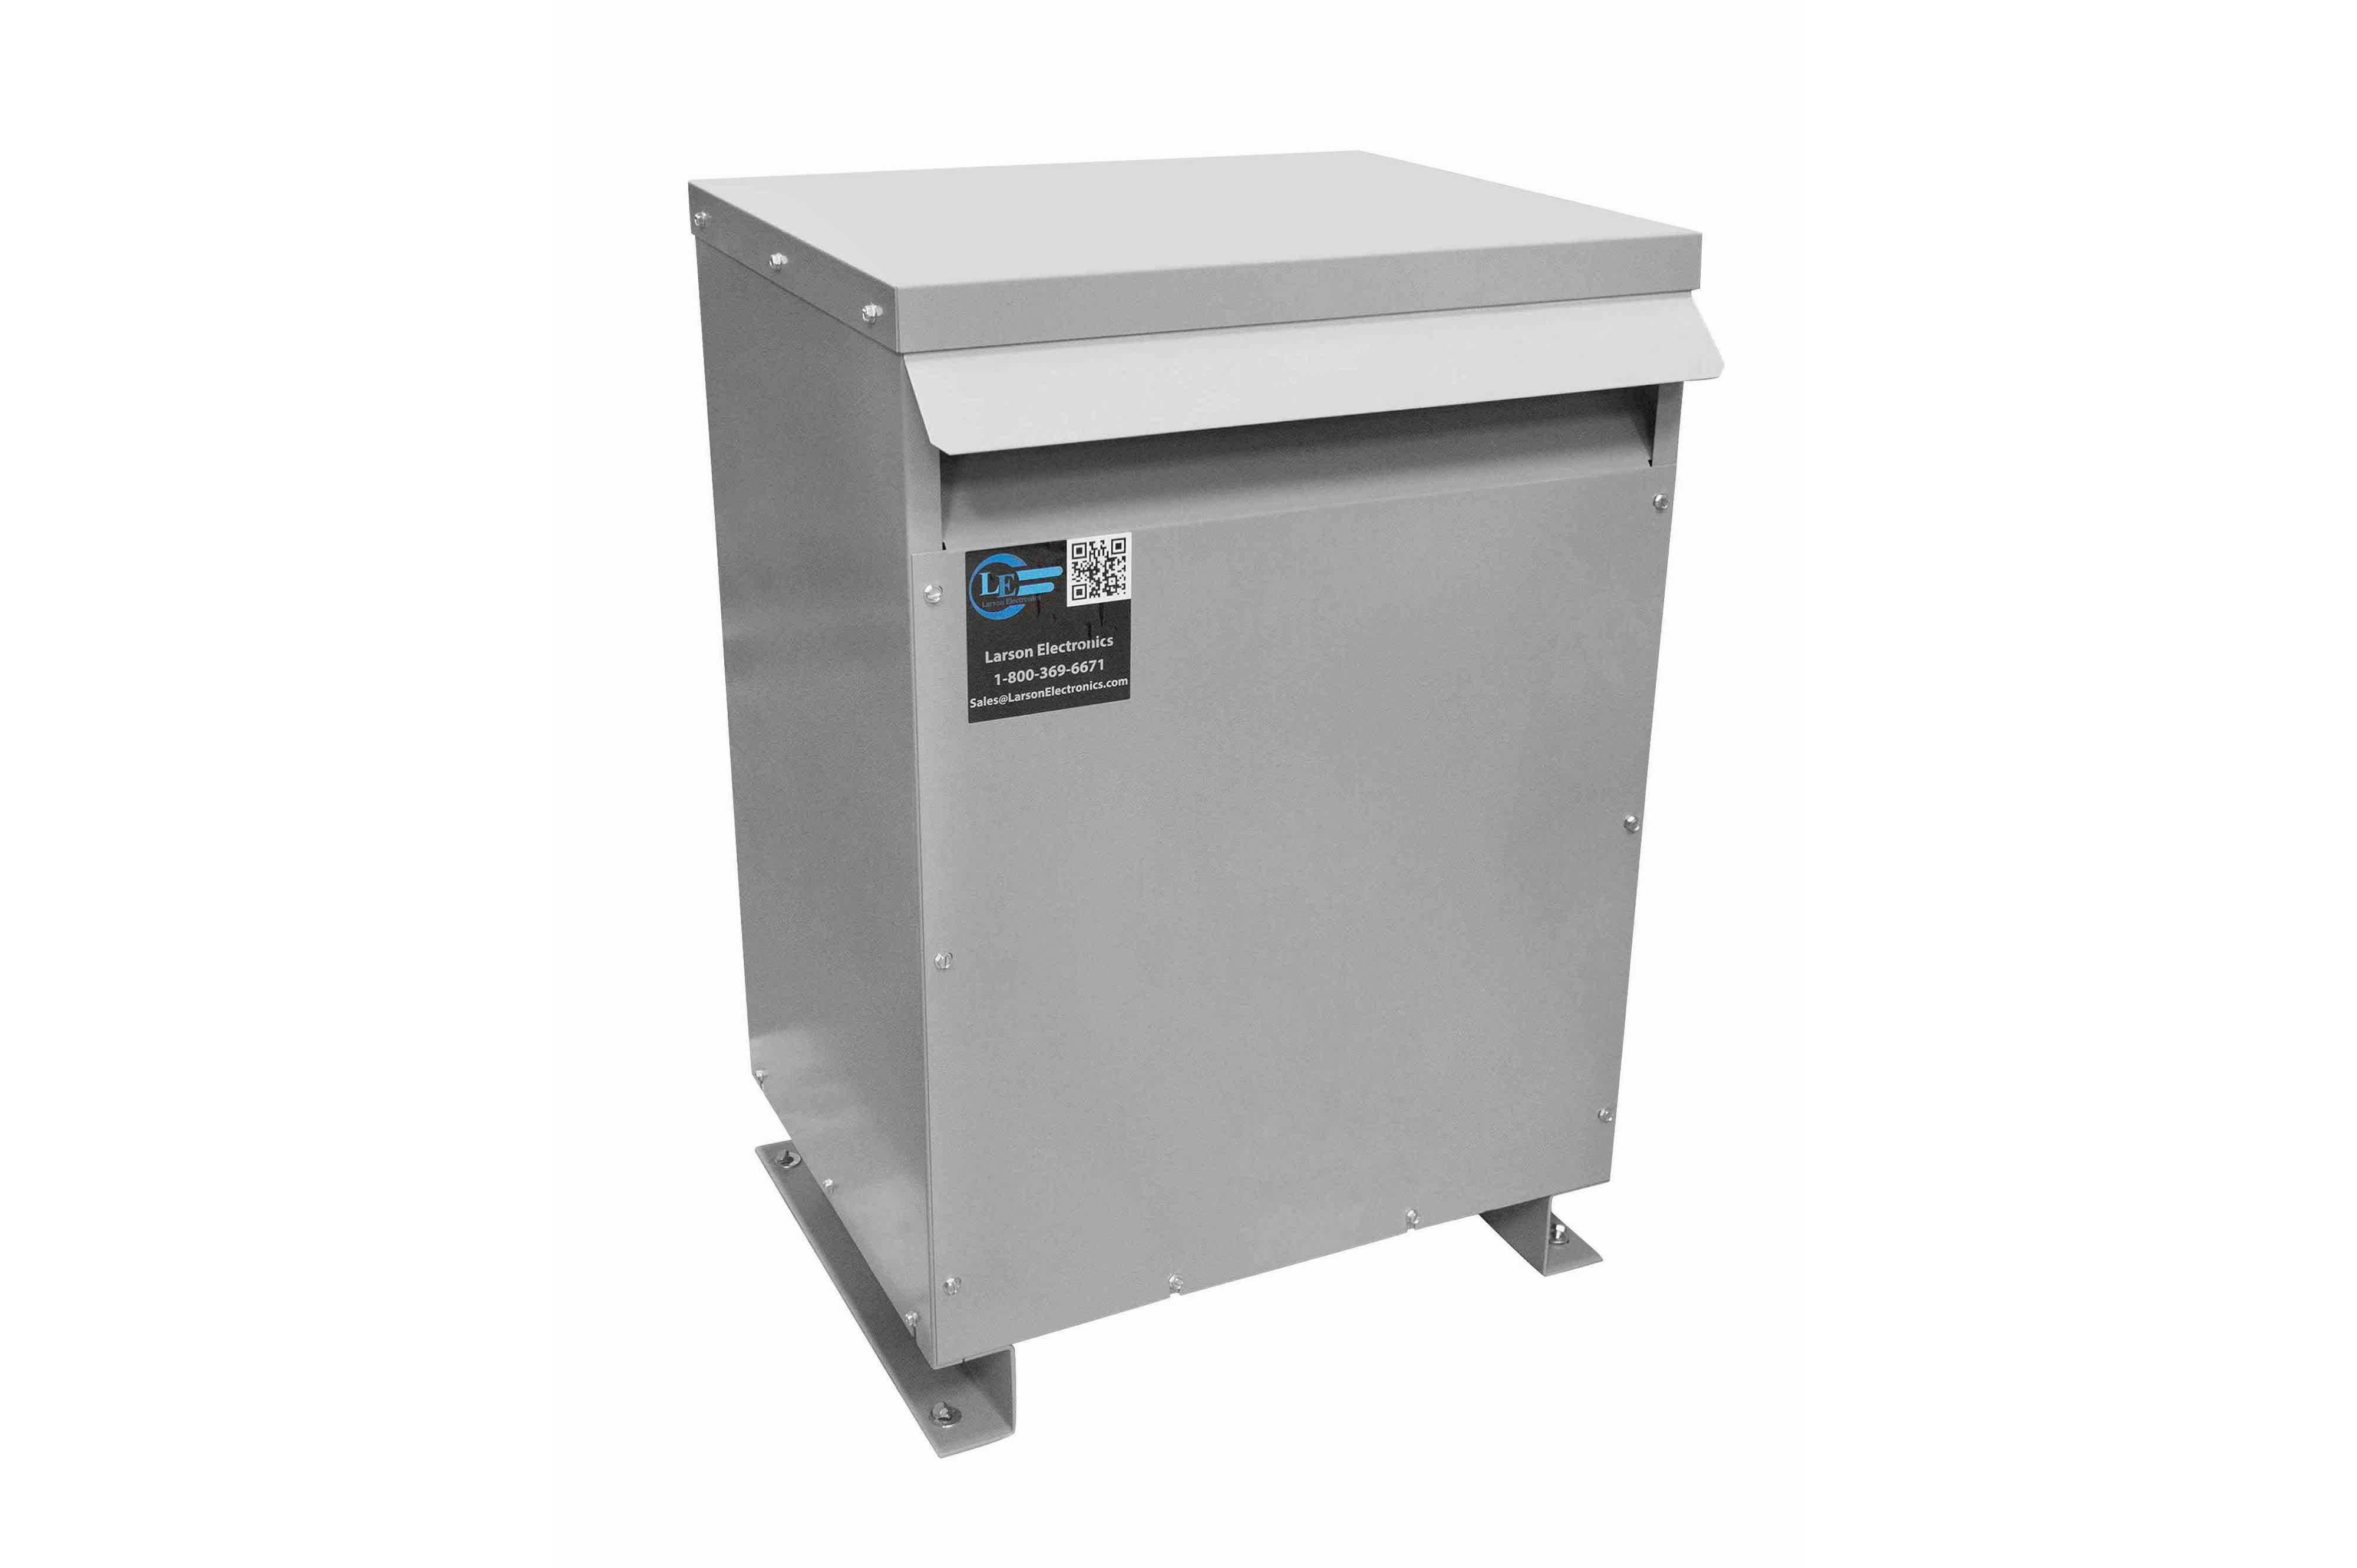 400 kVA 3PH Isolation Transformer, 480V Wye Primary, 208V Delta Secondary, N3R, Ventilated, 60 Hz